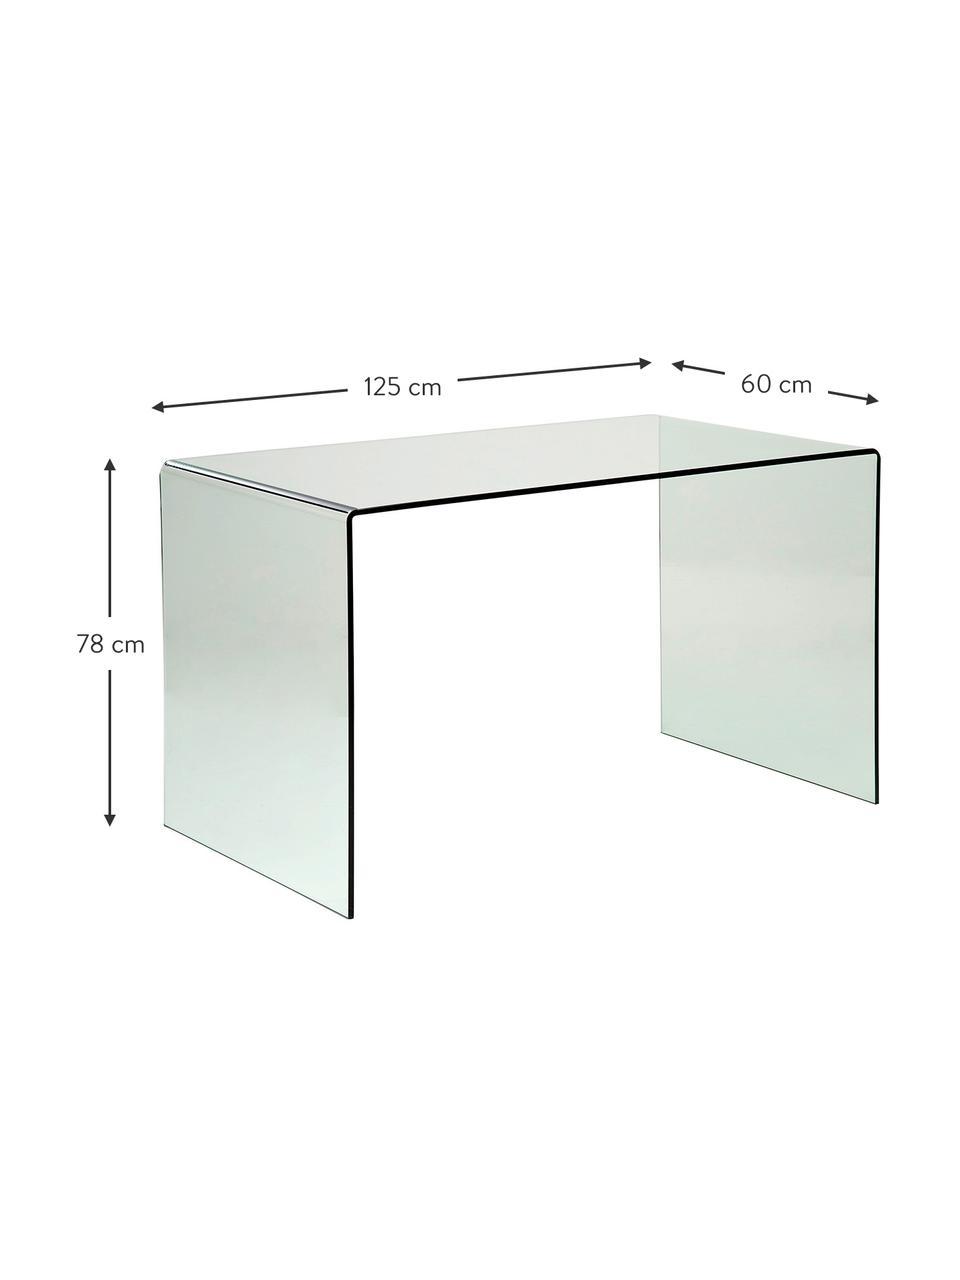 Scrivania in vetro Club, Vetro, Trasparente, Larg. 125 x Prof. 60 cm